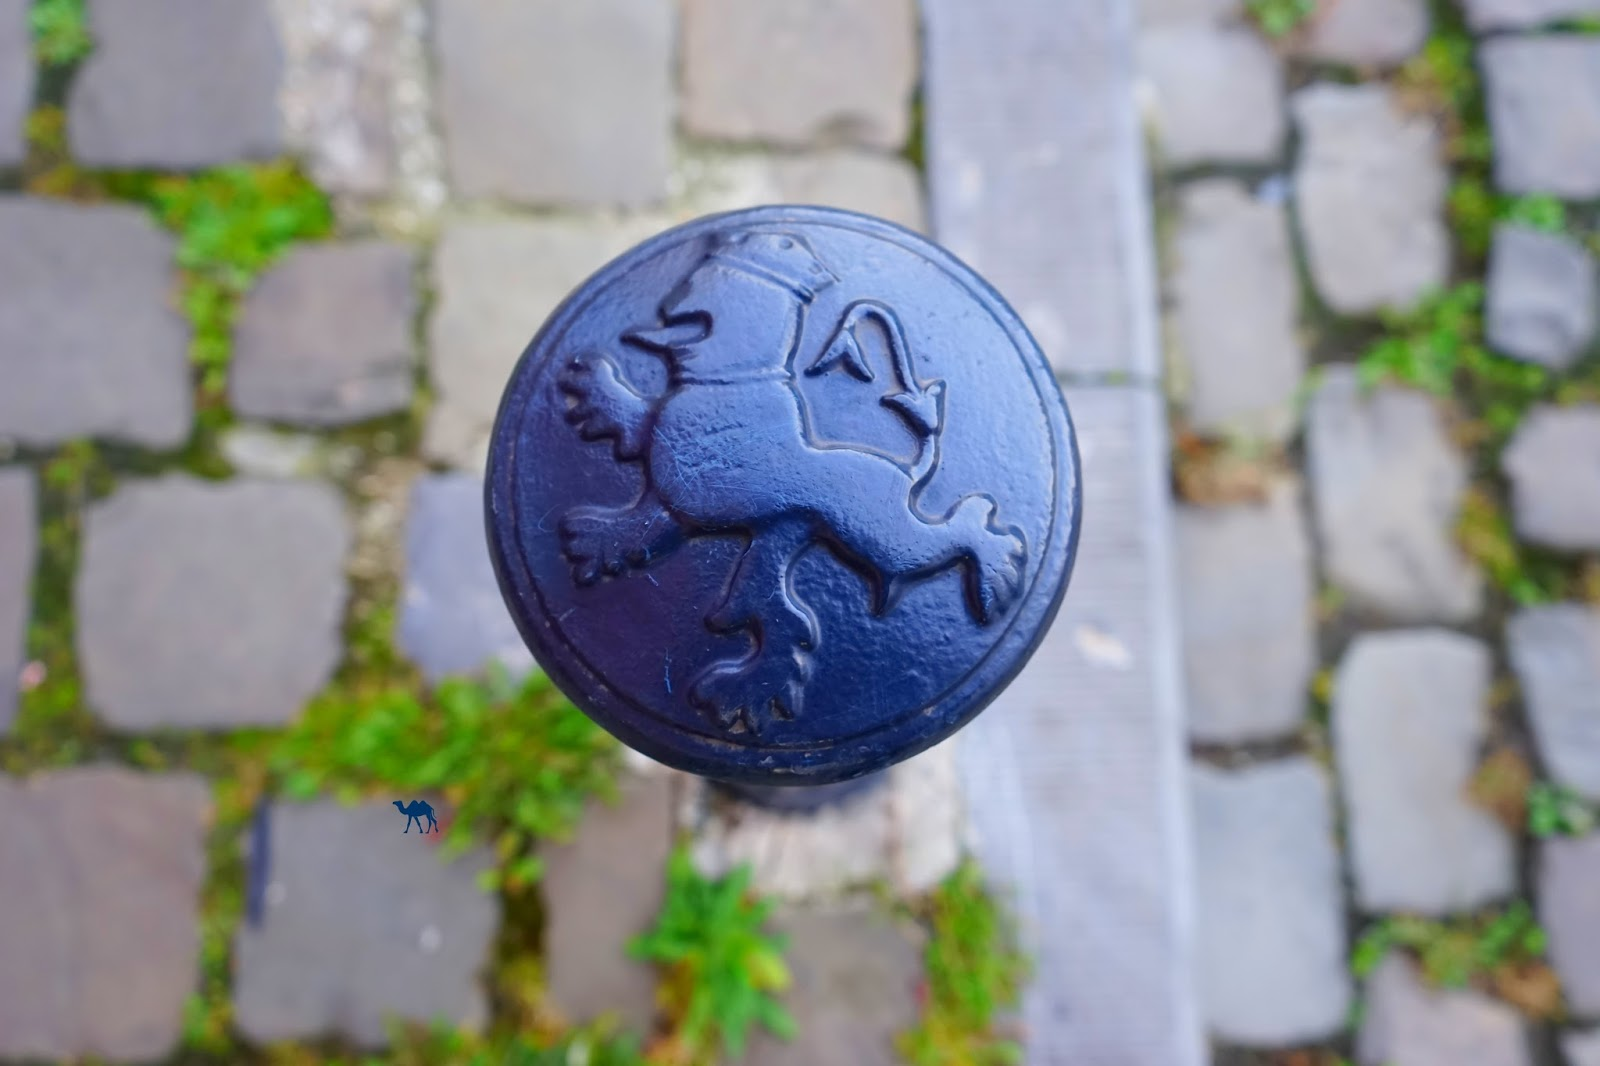 Le Chameau Bleu  -  Blog Voyage Gand Belgique - Tourisme Gand Belgique - Charme de la ville de Gand - Ghent Gent belgique